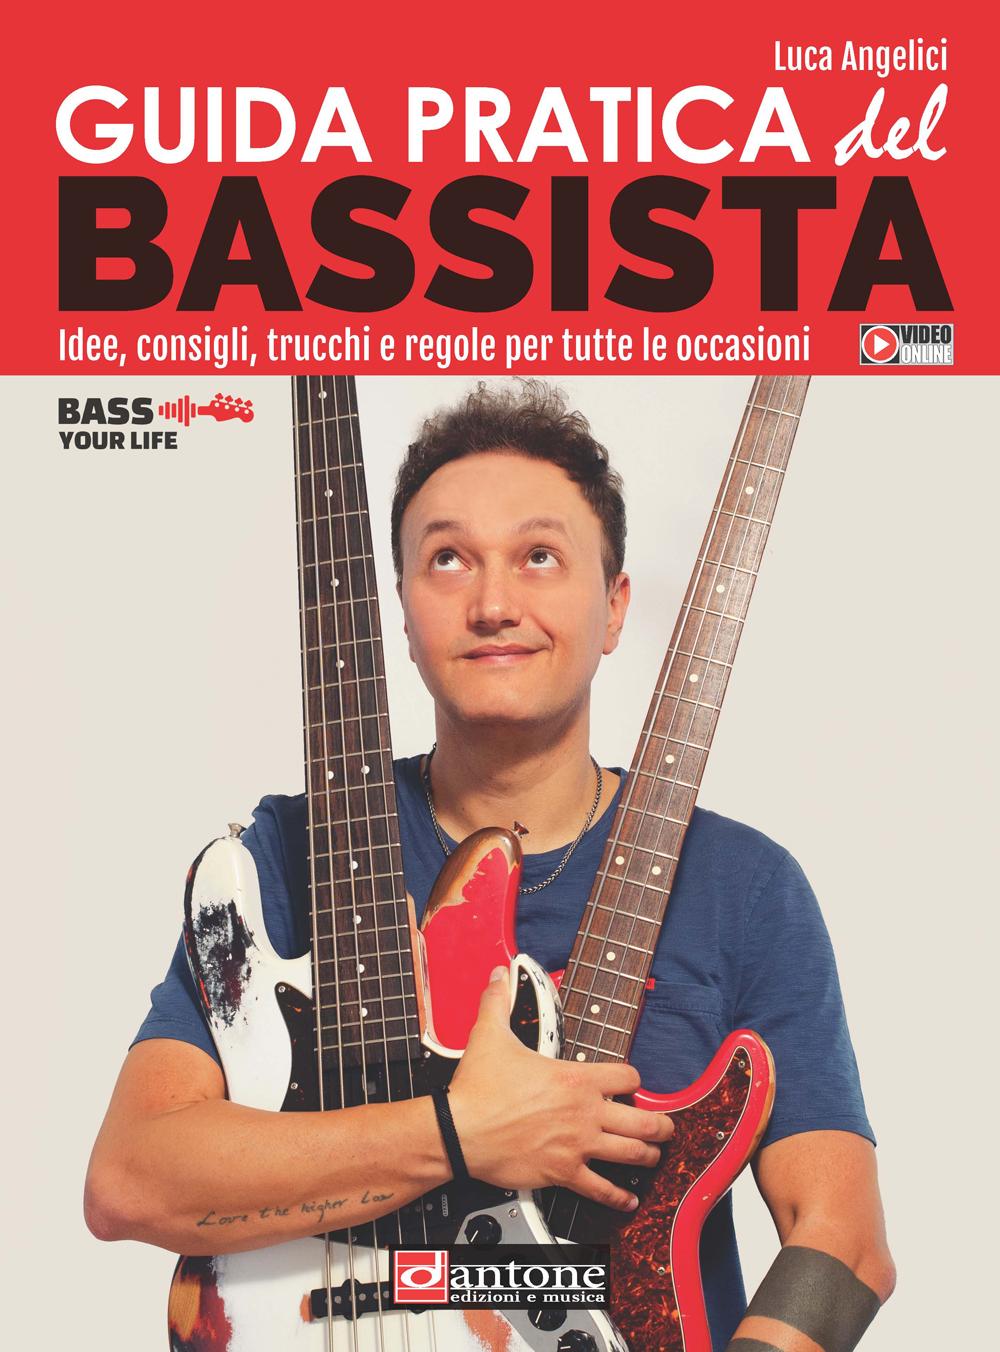 Luca Angelici: Guida Pratica Del Bassista: Bass Guitar